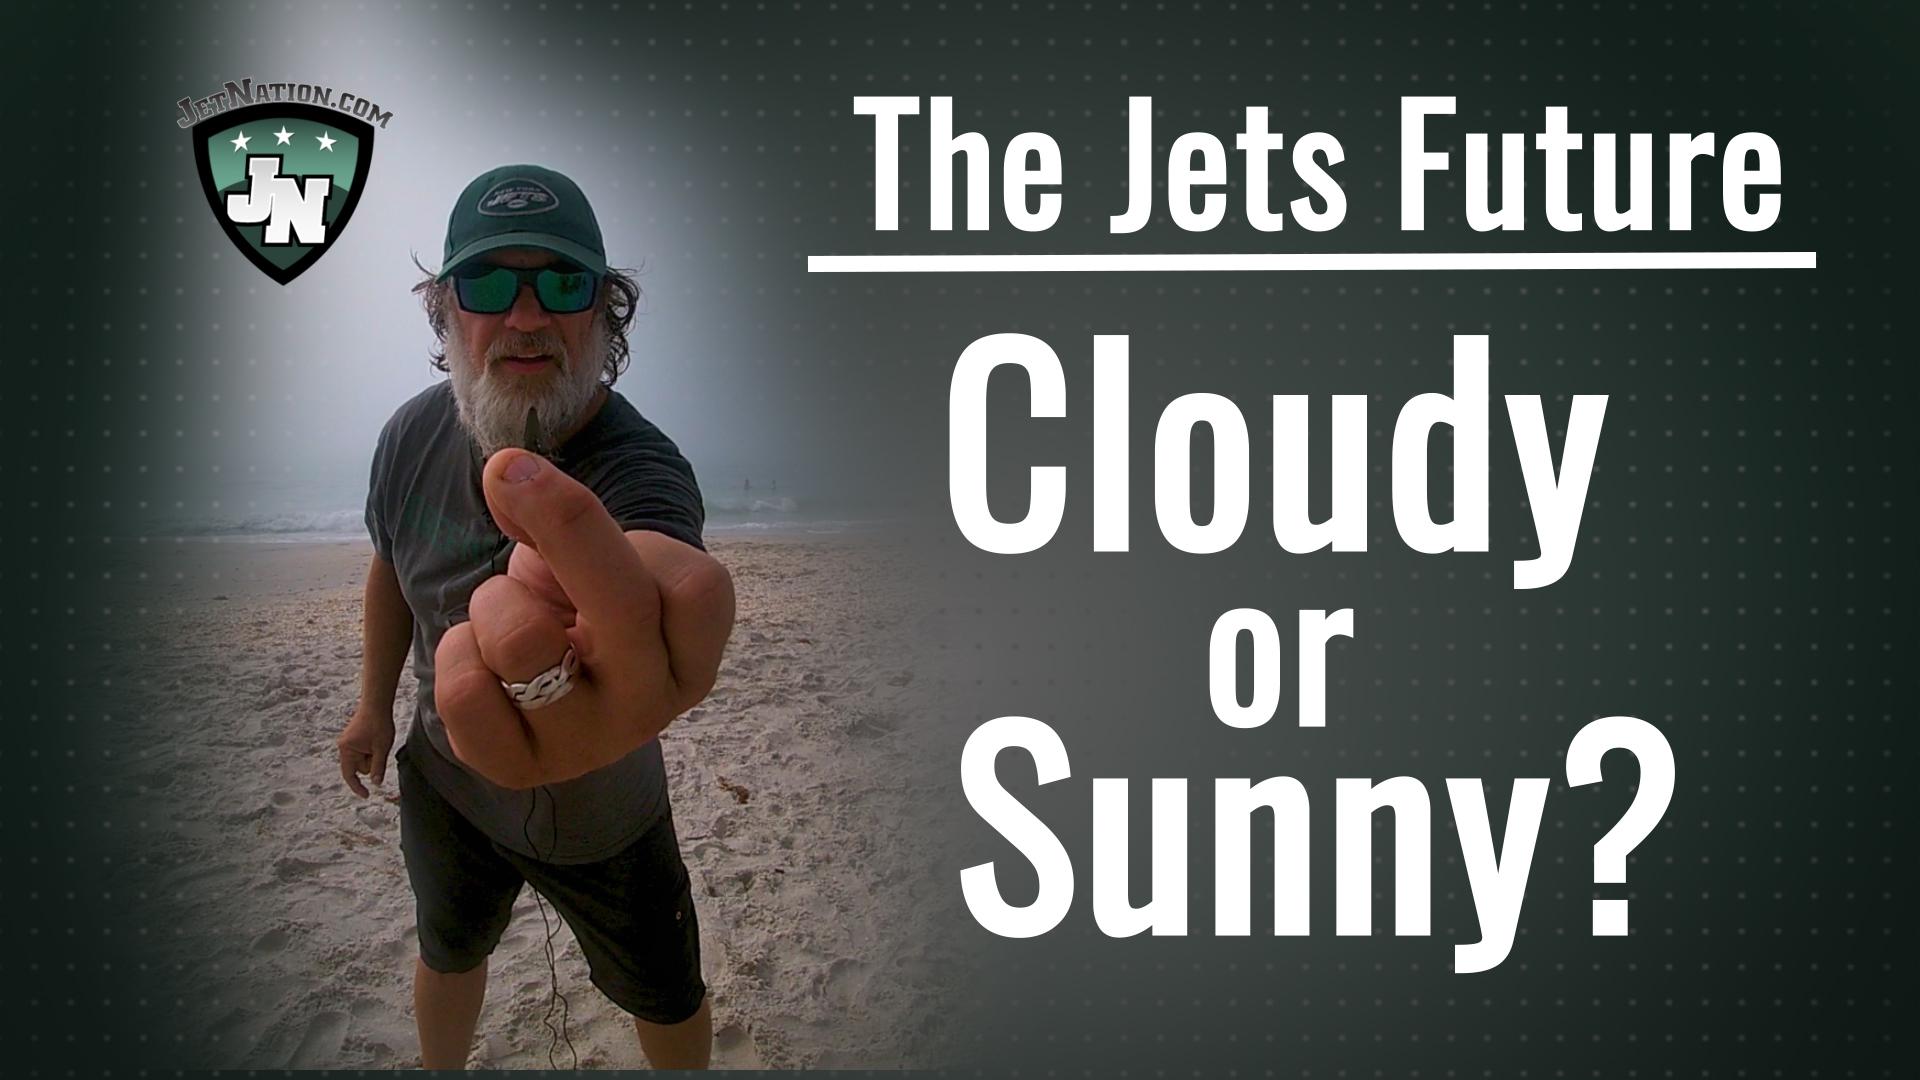 Deshaun Watson to the Jets